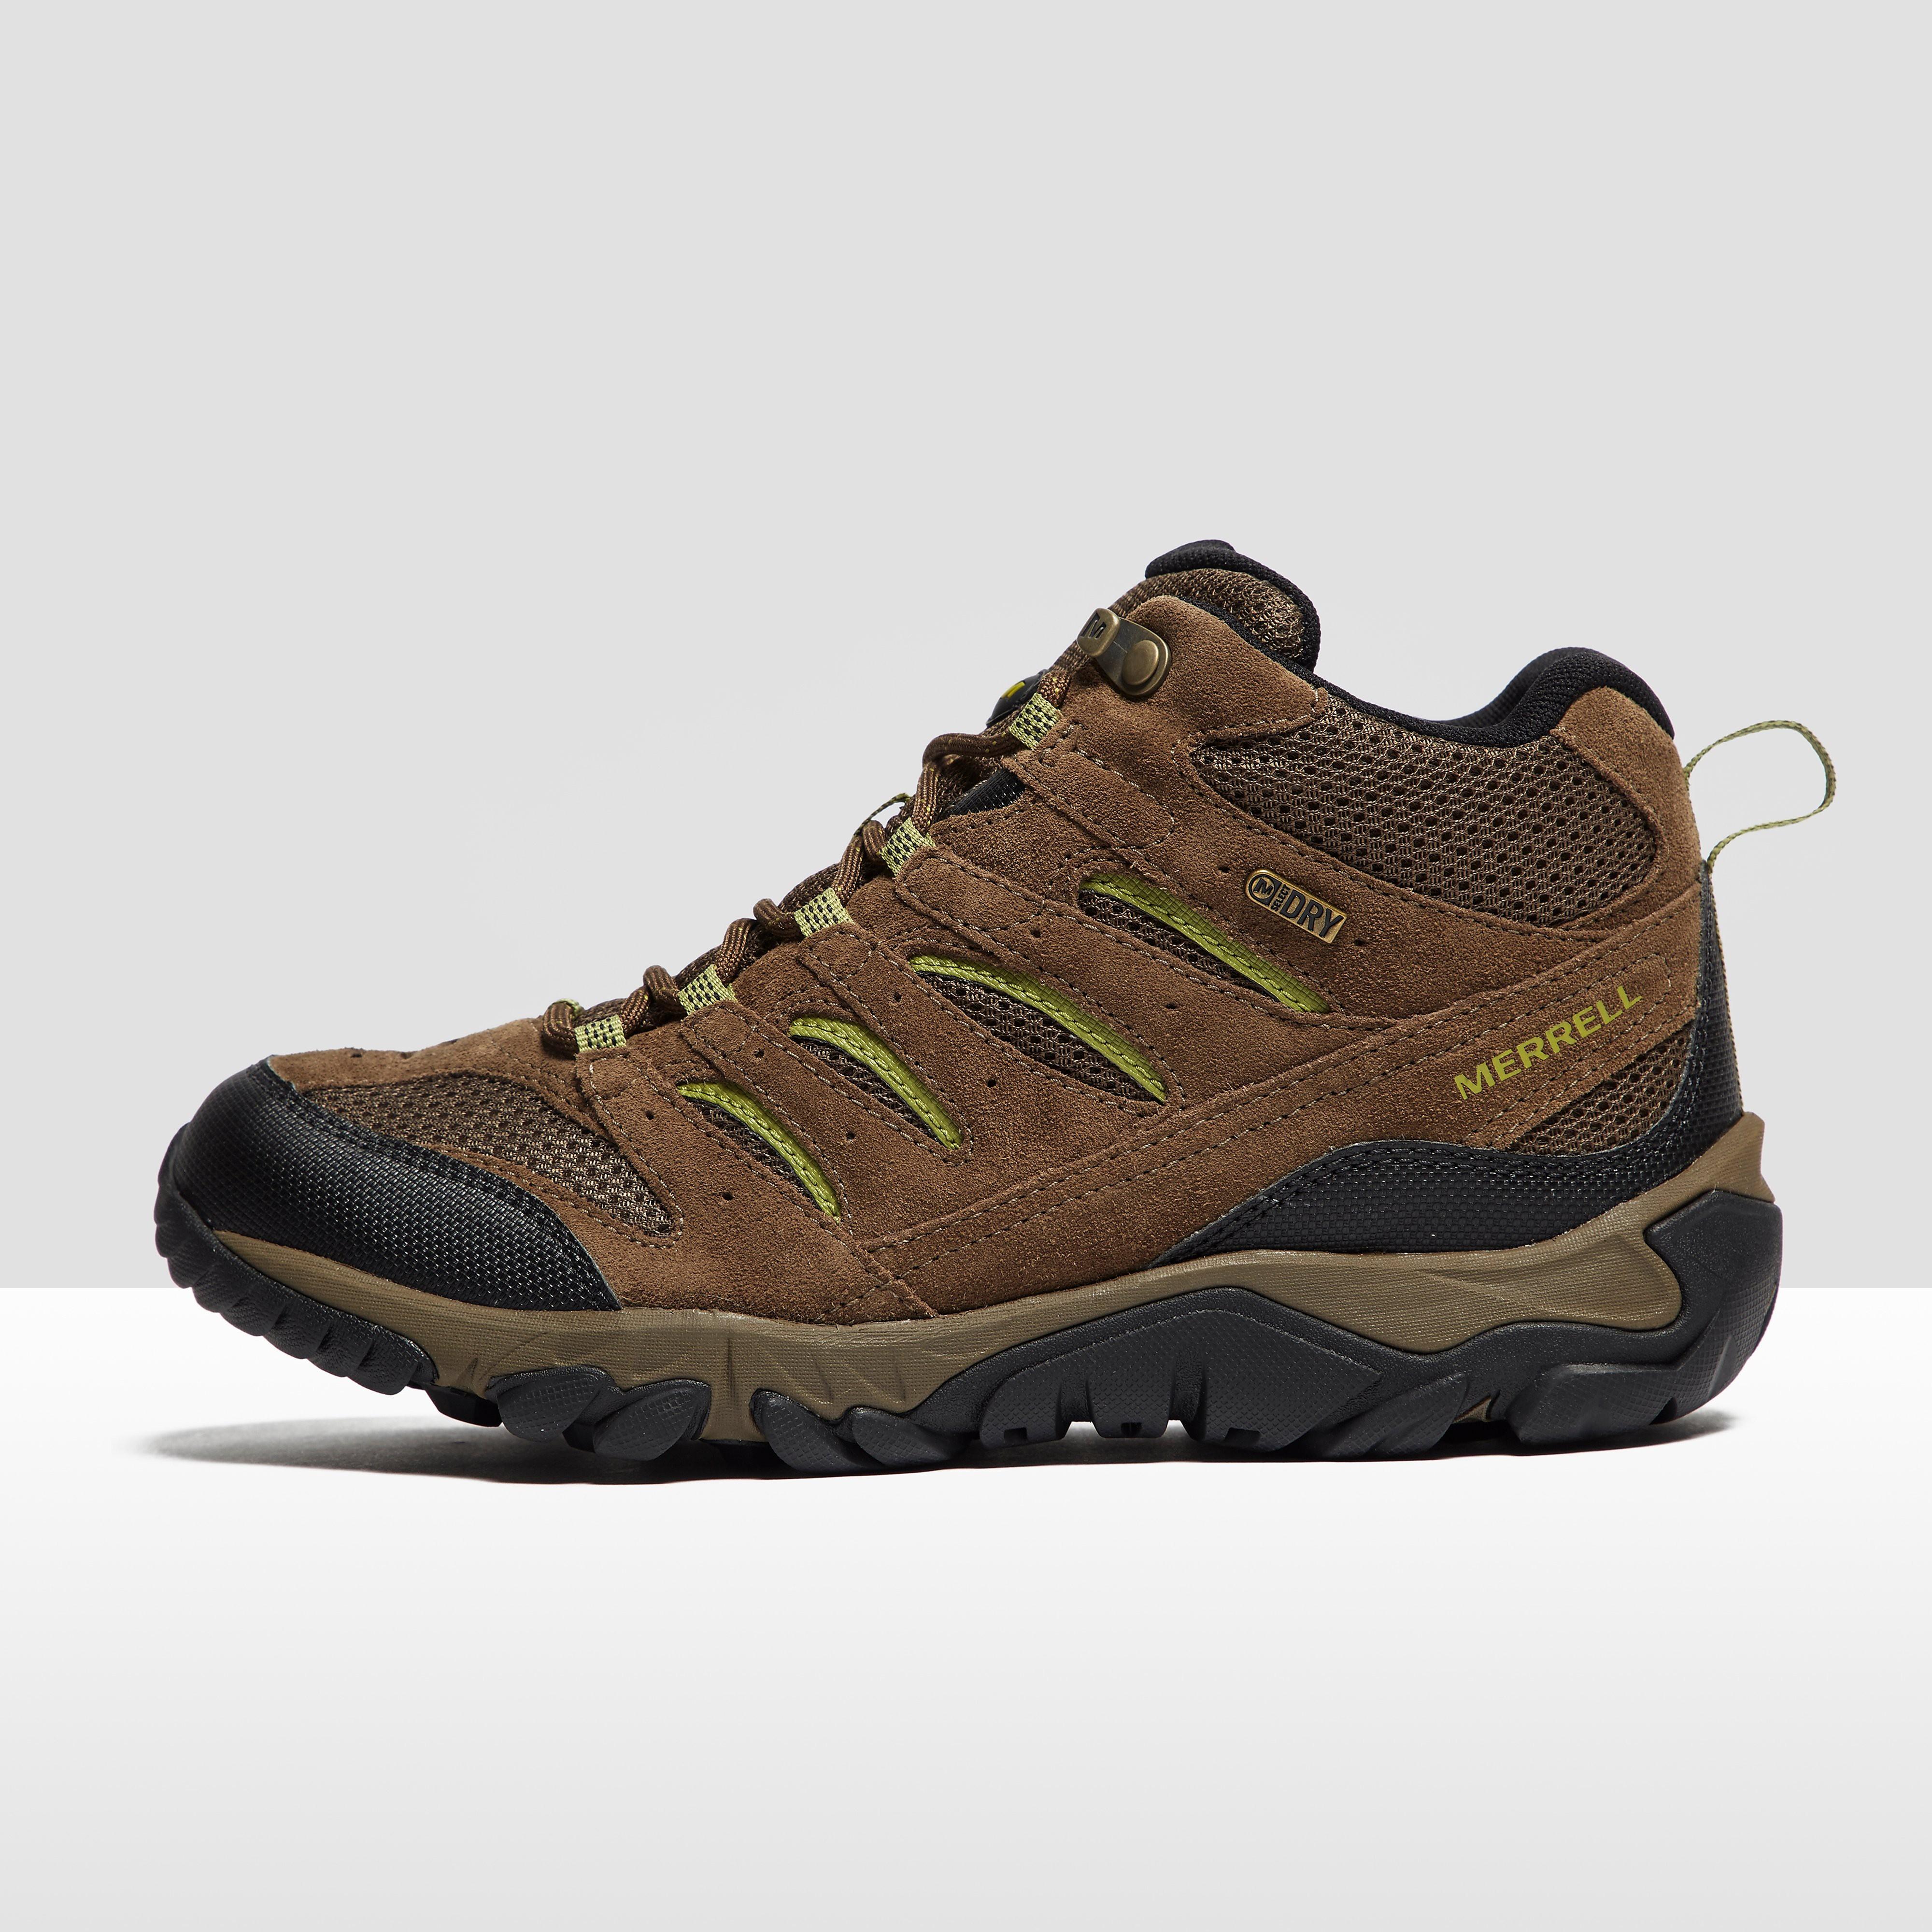 Merrell White Pine Mid Vent Men's Waterproof Hiking Boots